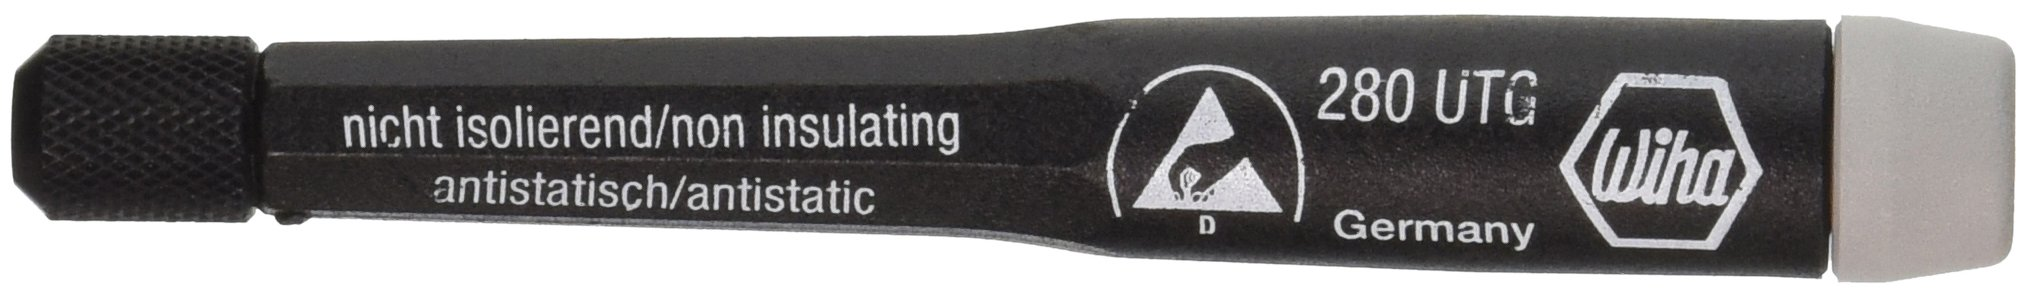 Wiha 28001 System 4 ESD Safe Dissipative Precision Adjustable Handle, 4.0mm